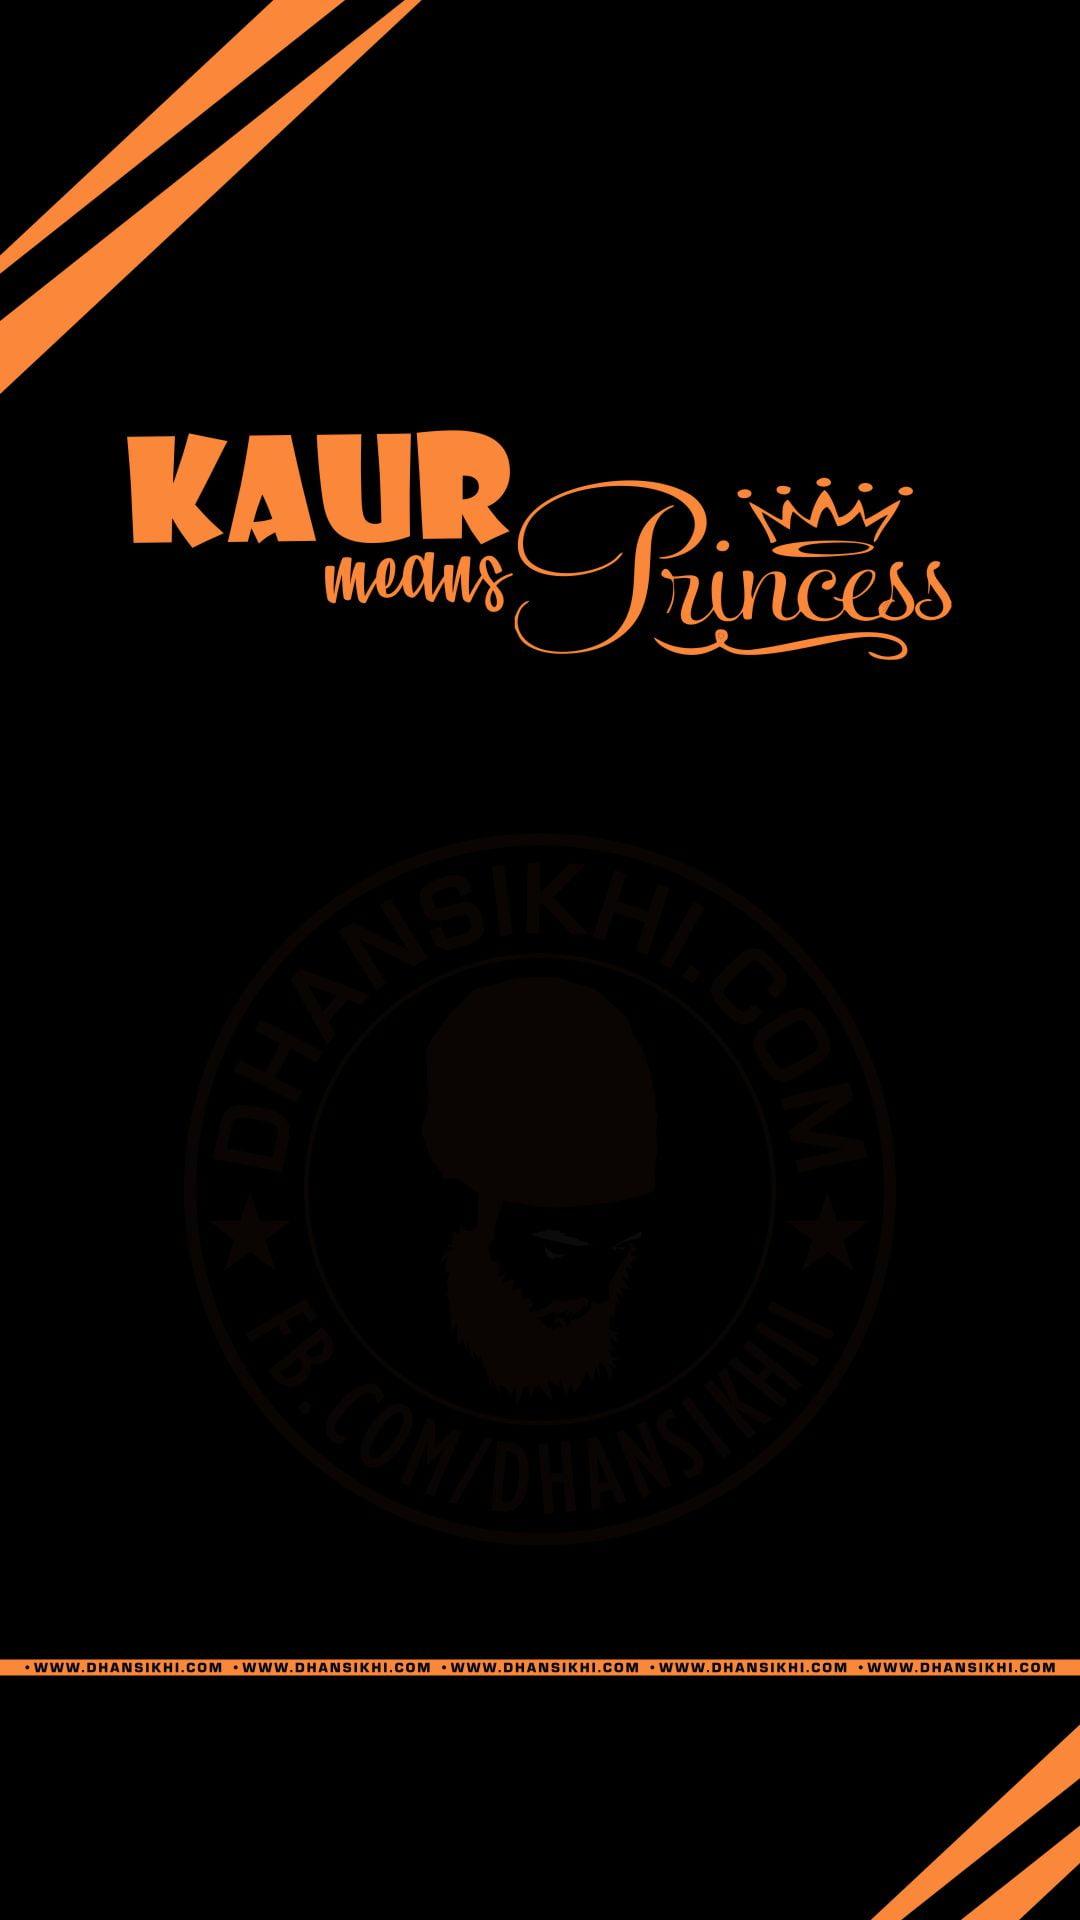 Mobile Wallpaper - Kour Means Princess